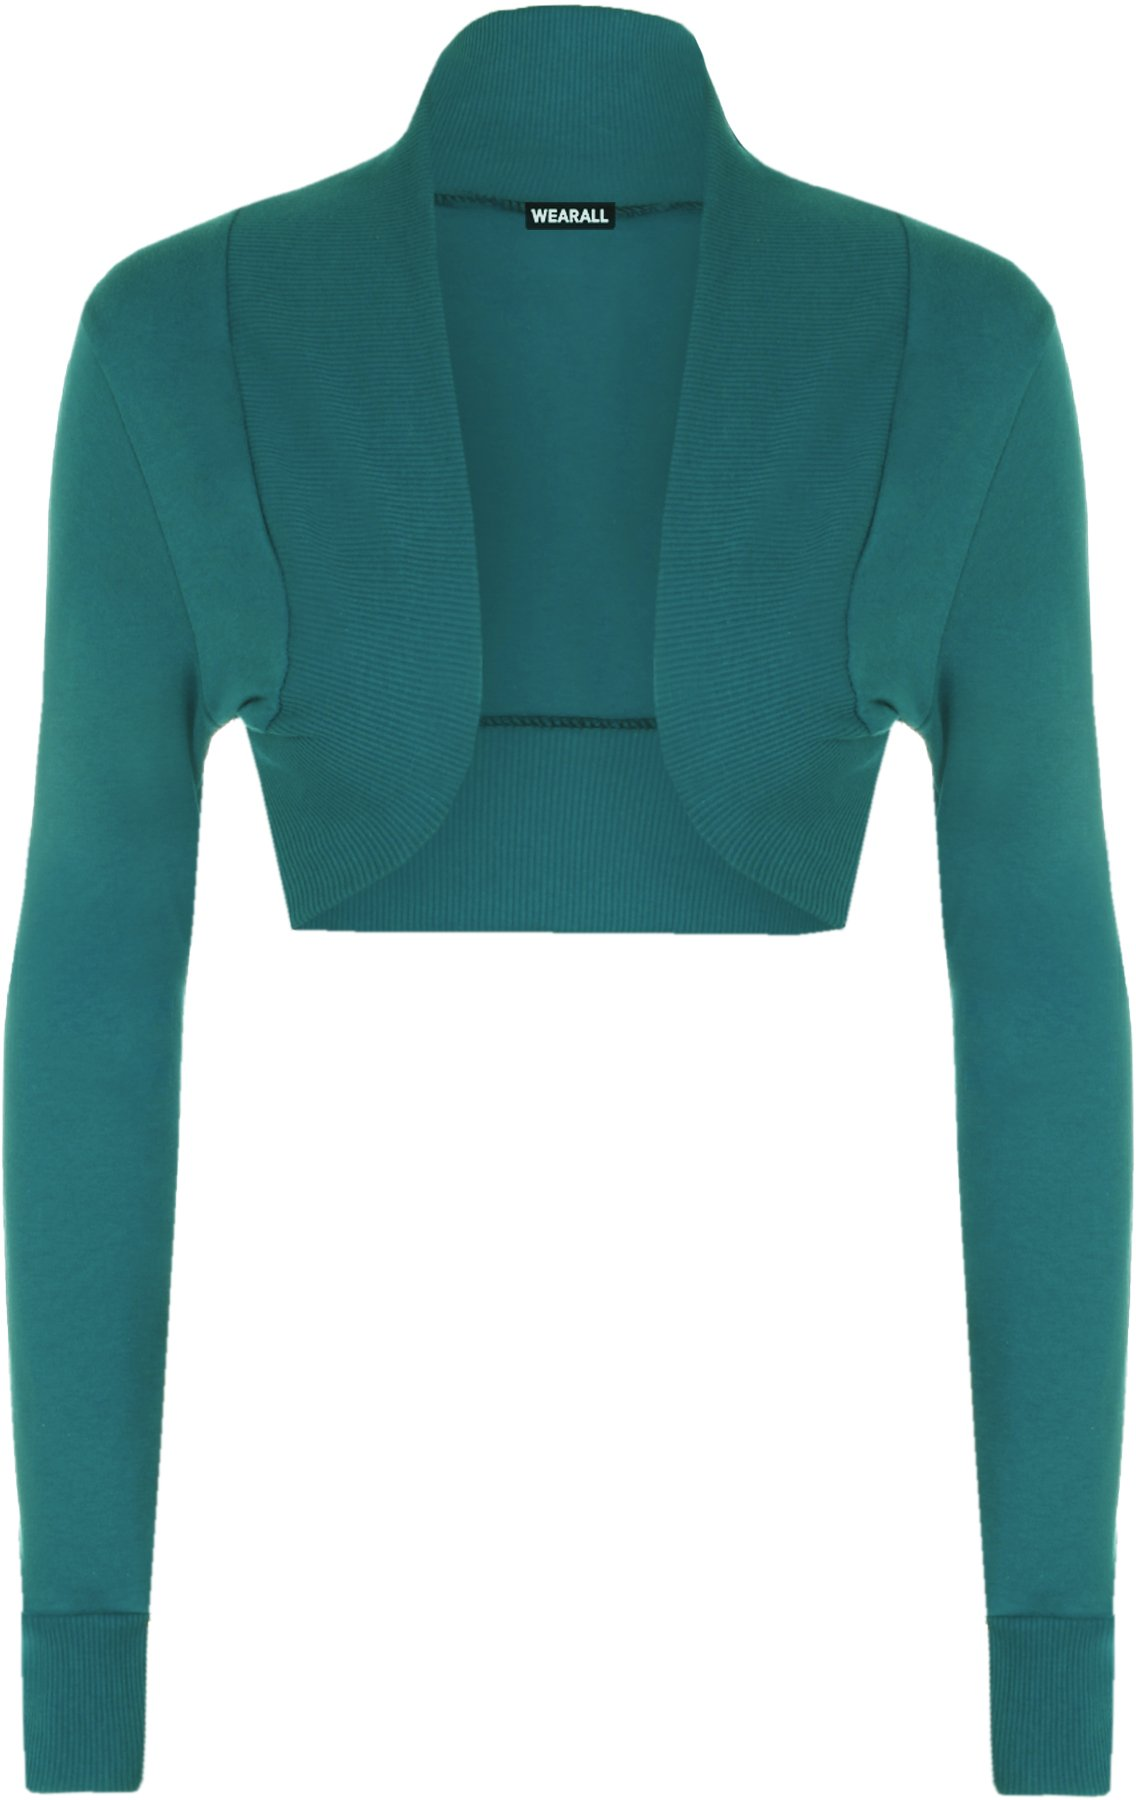 WearAll Women's Shrug Long Sleeve Ladies Bolero Top - Teal - US 4-6 (UK 8-10)